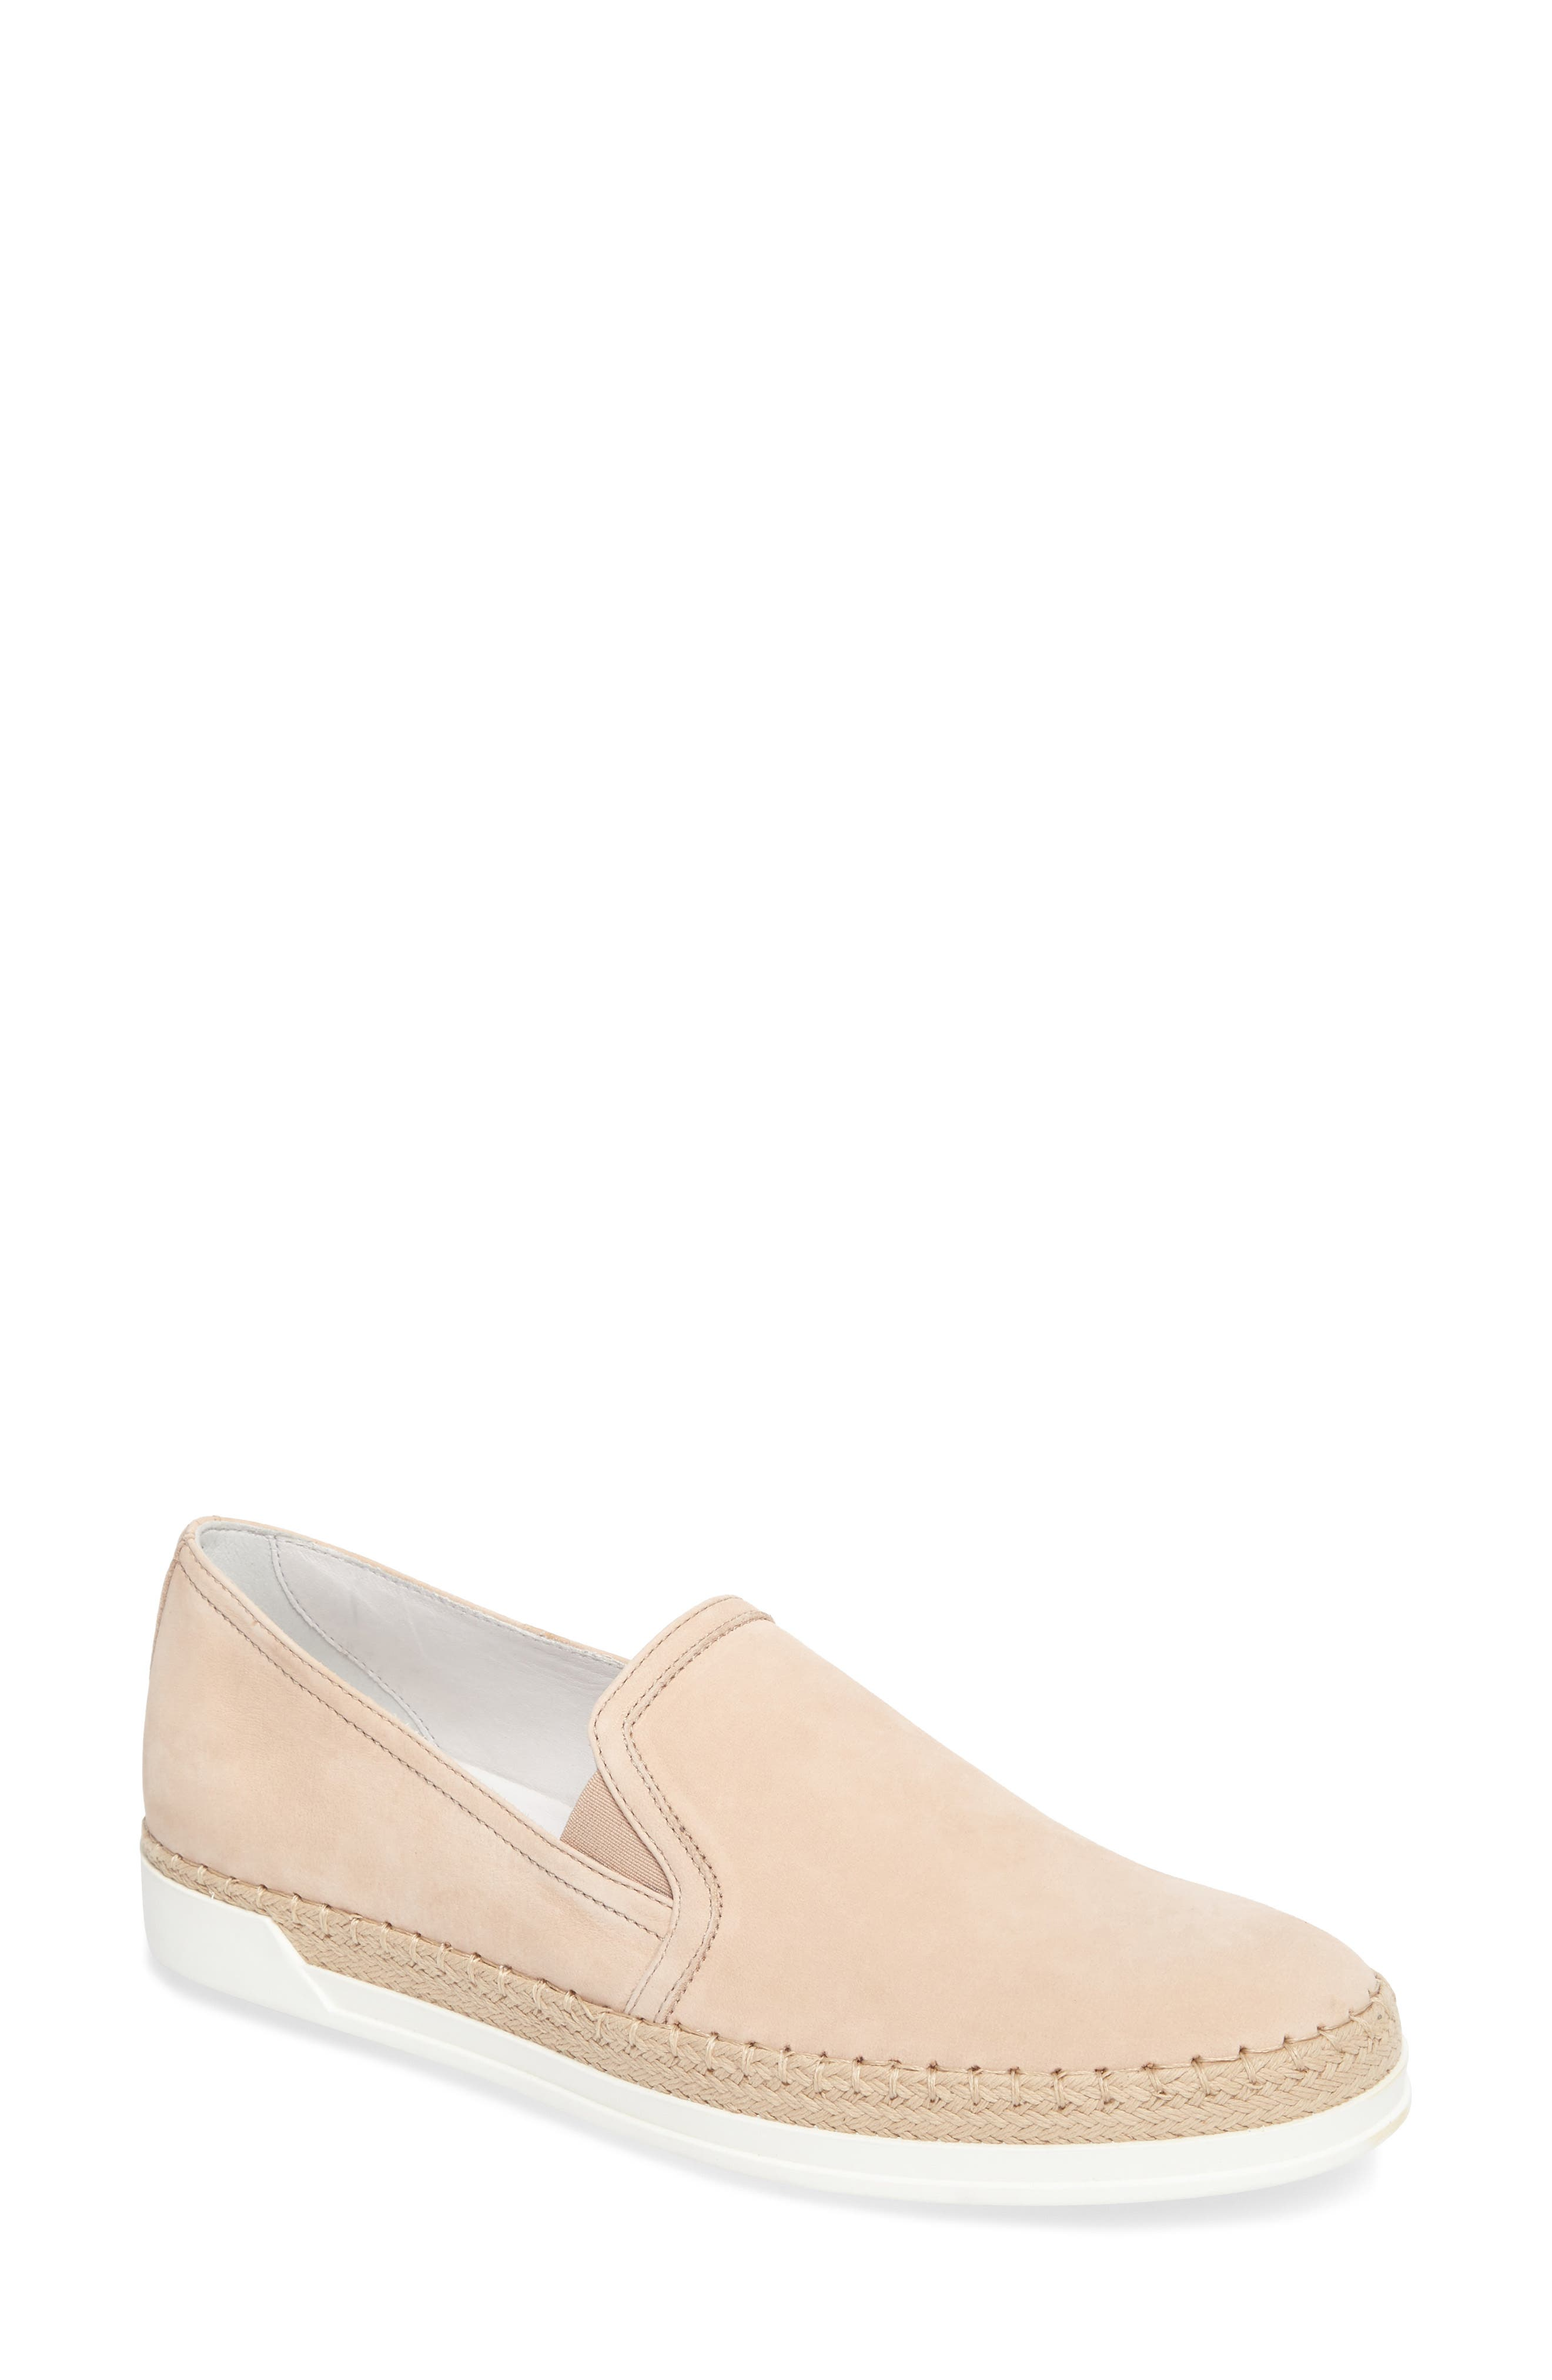 Espadrille Slip-On Sneaker,                             Main thumbnail 1, color,                             Ballerina Pink